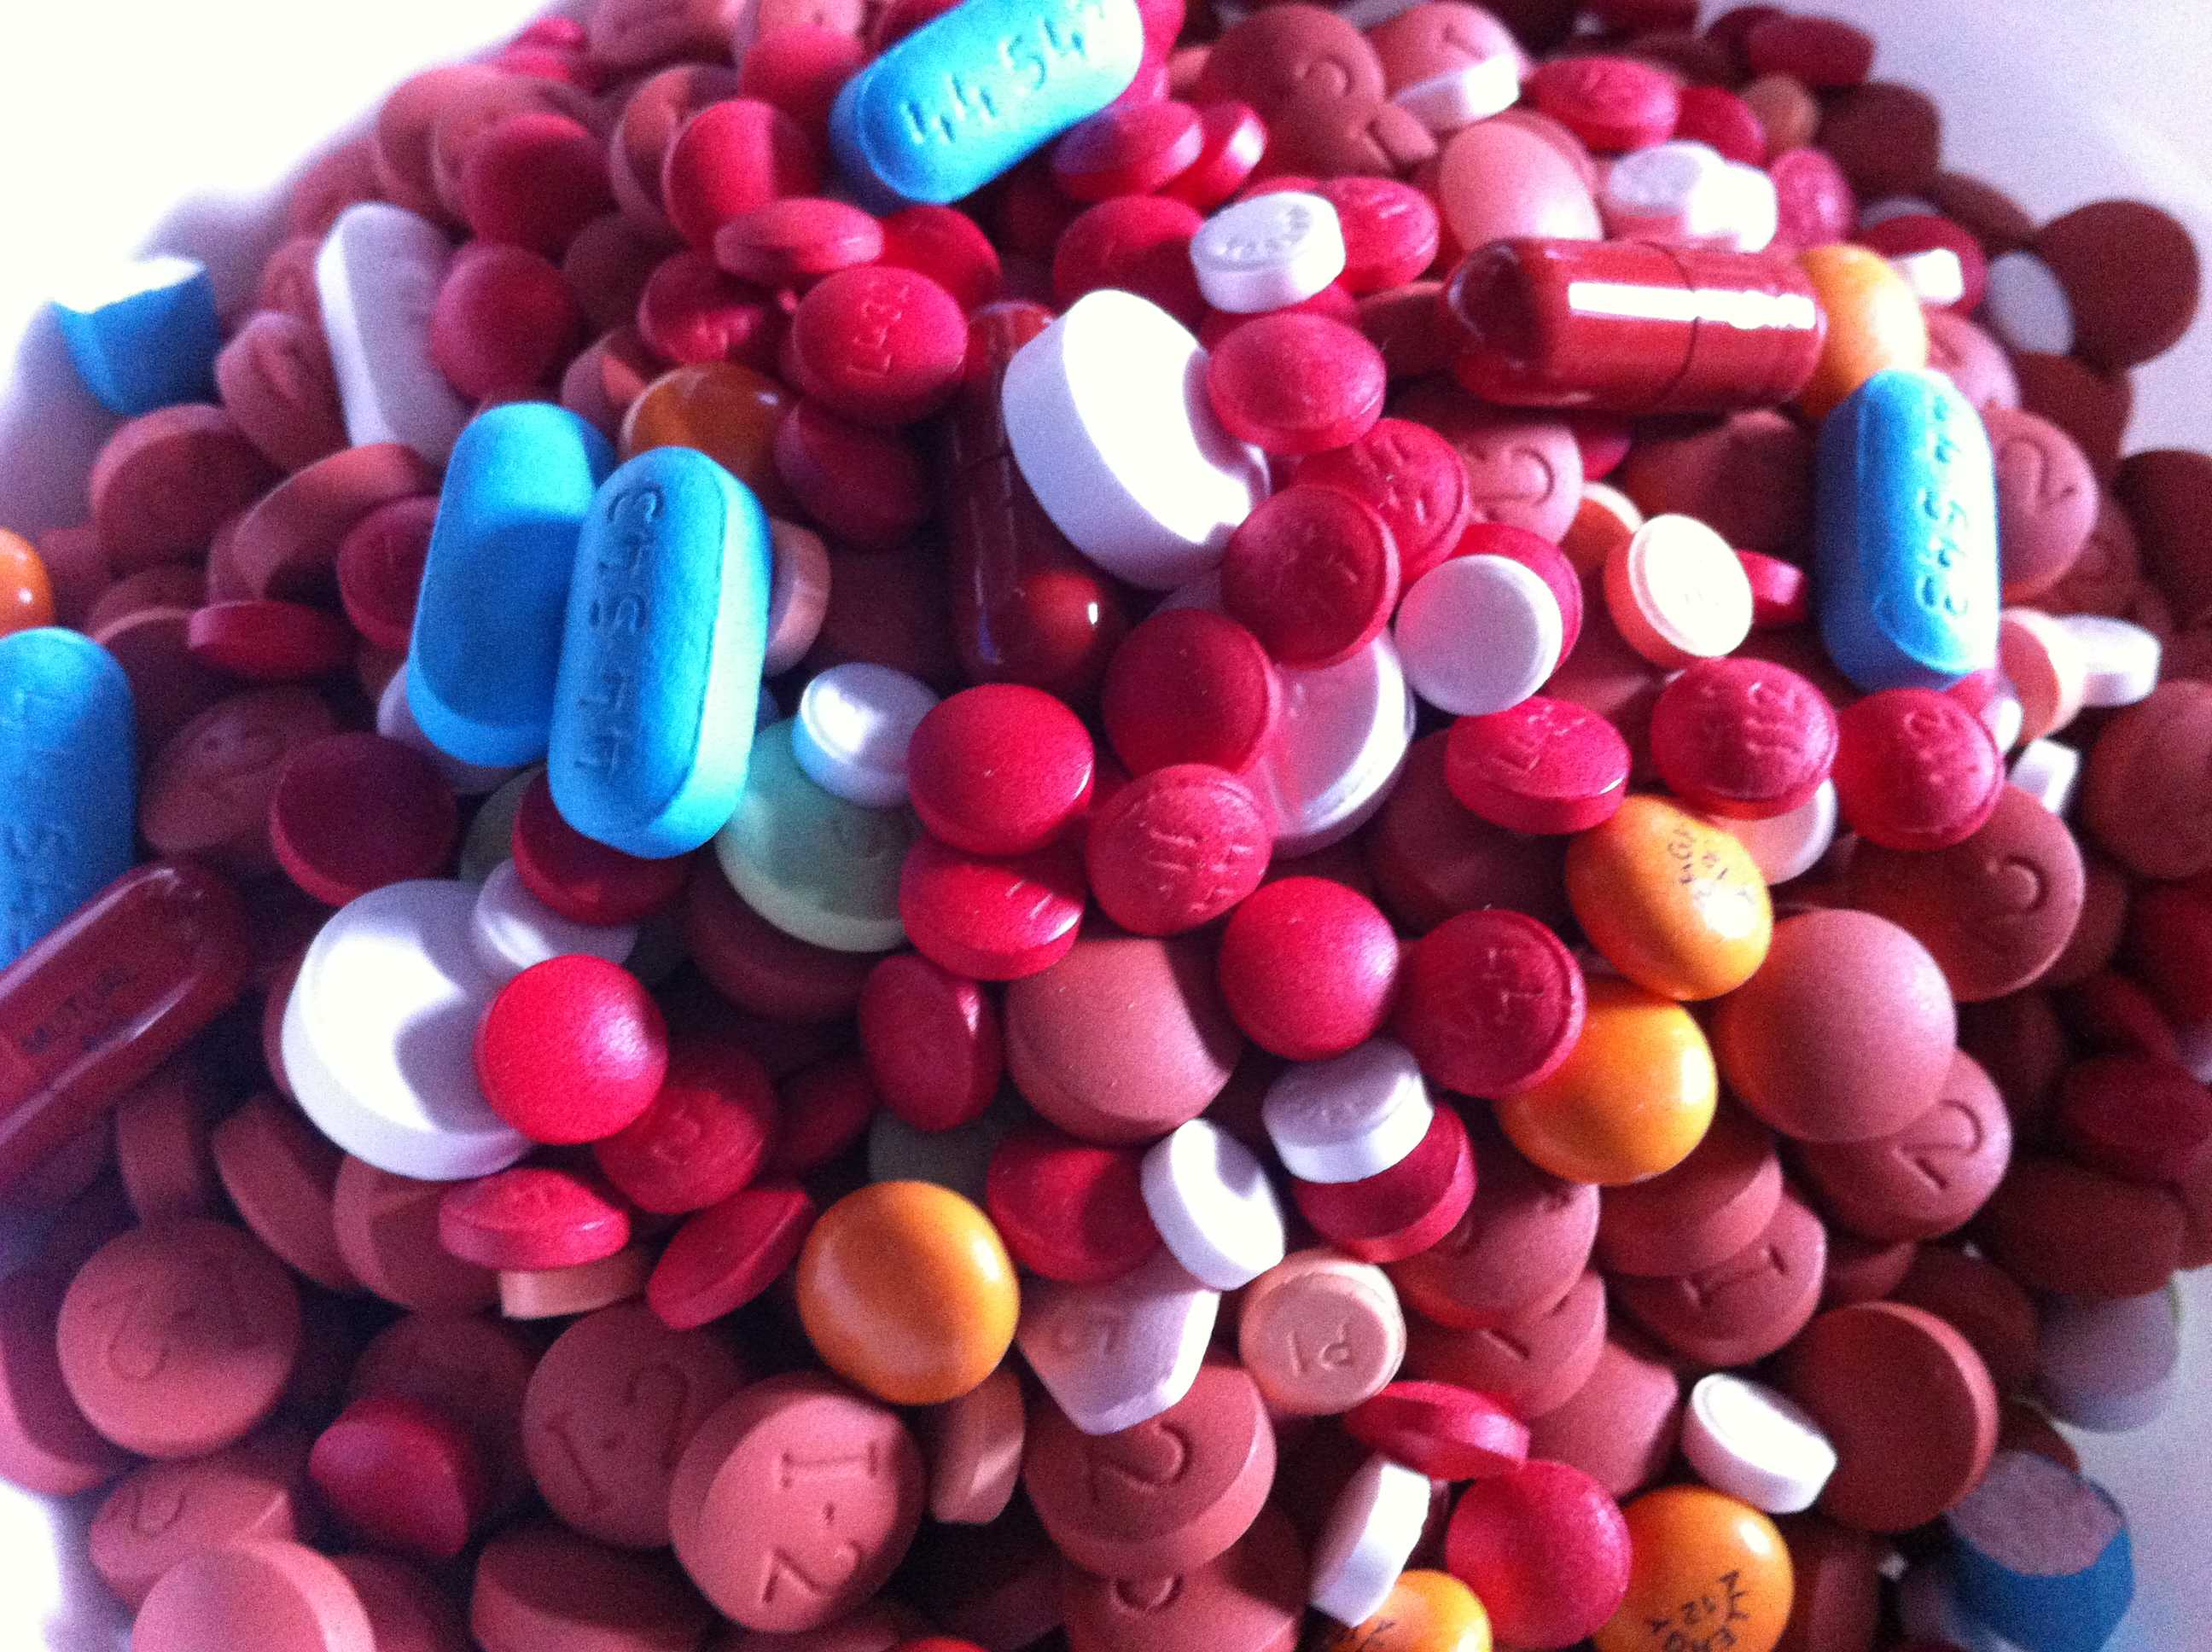 Assorted_Pills_2